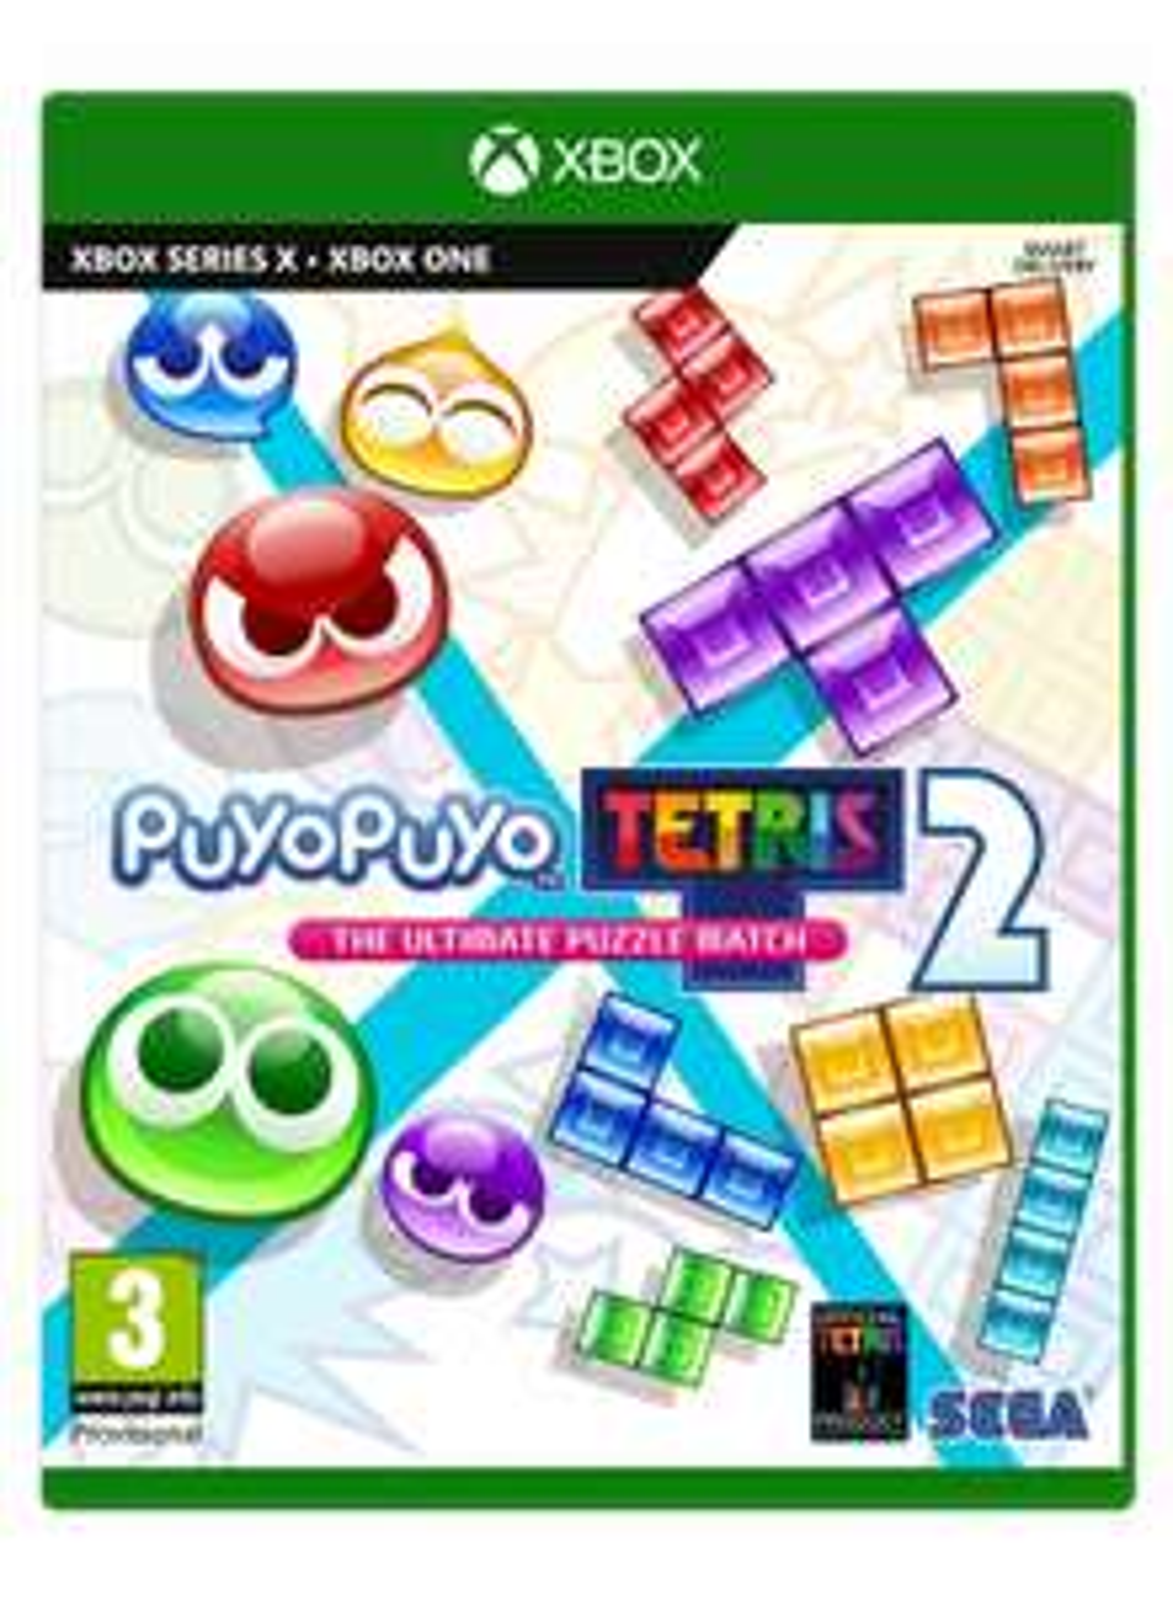 Puyo Puyo Tetris 2 Inc Bonus DLC (Xbox One / Series X) - £12 delivered using code @ Boss Deals / eBay